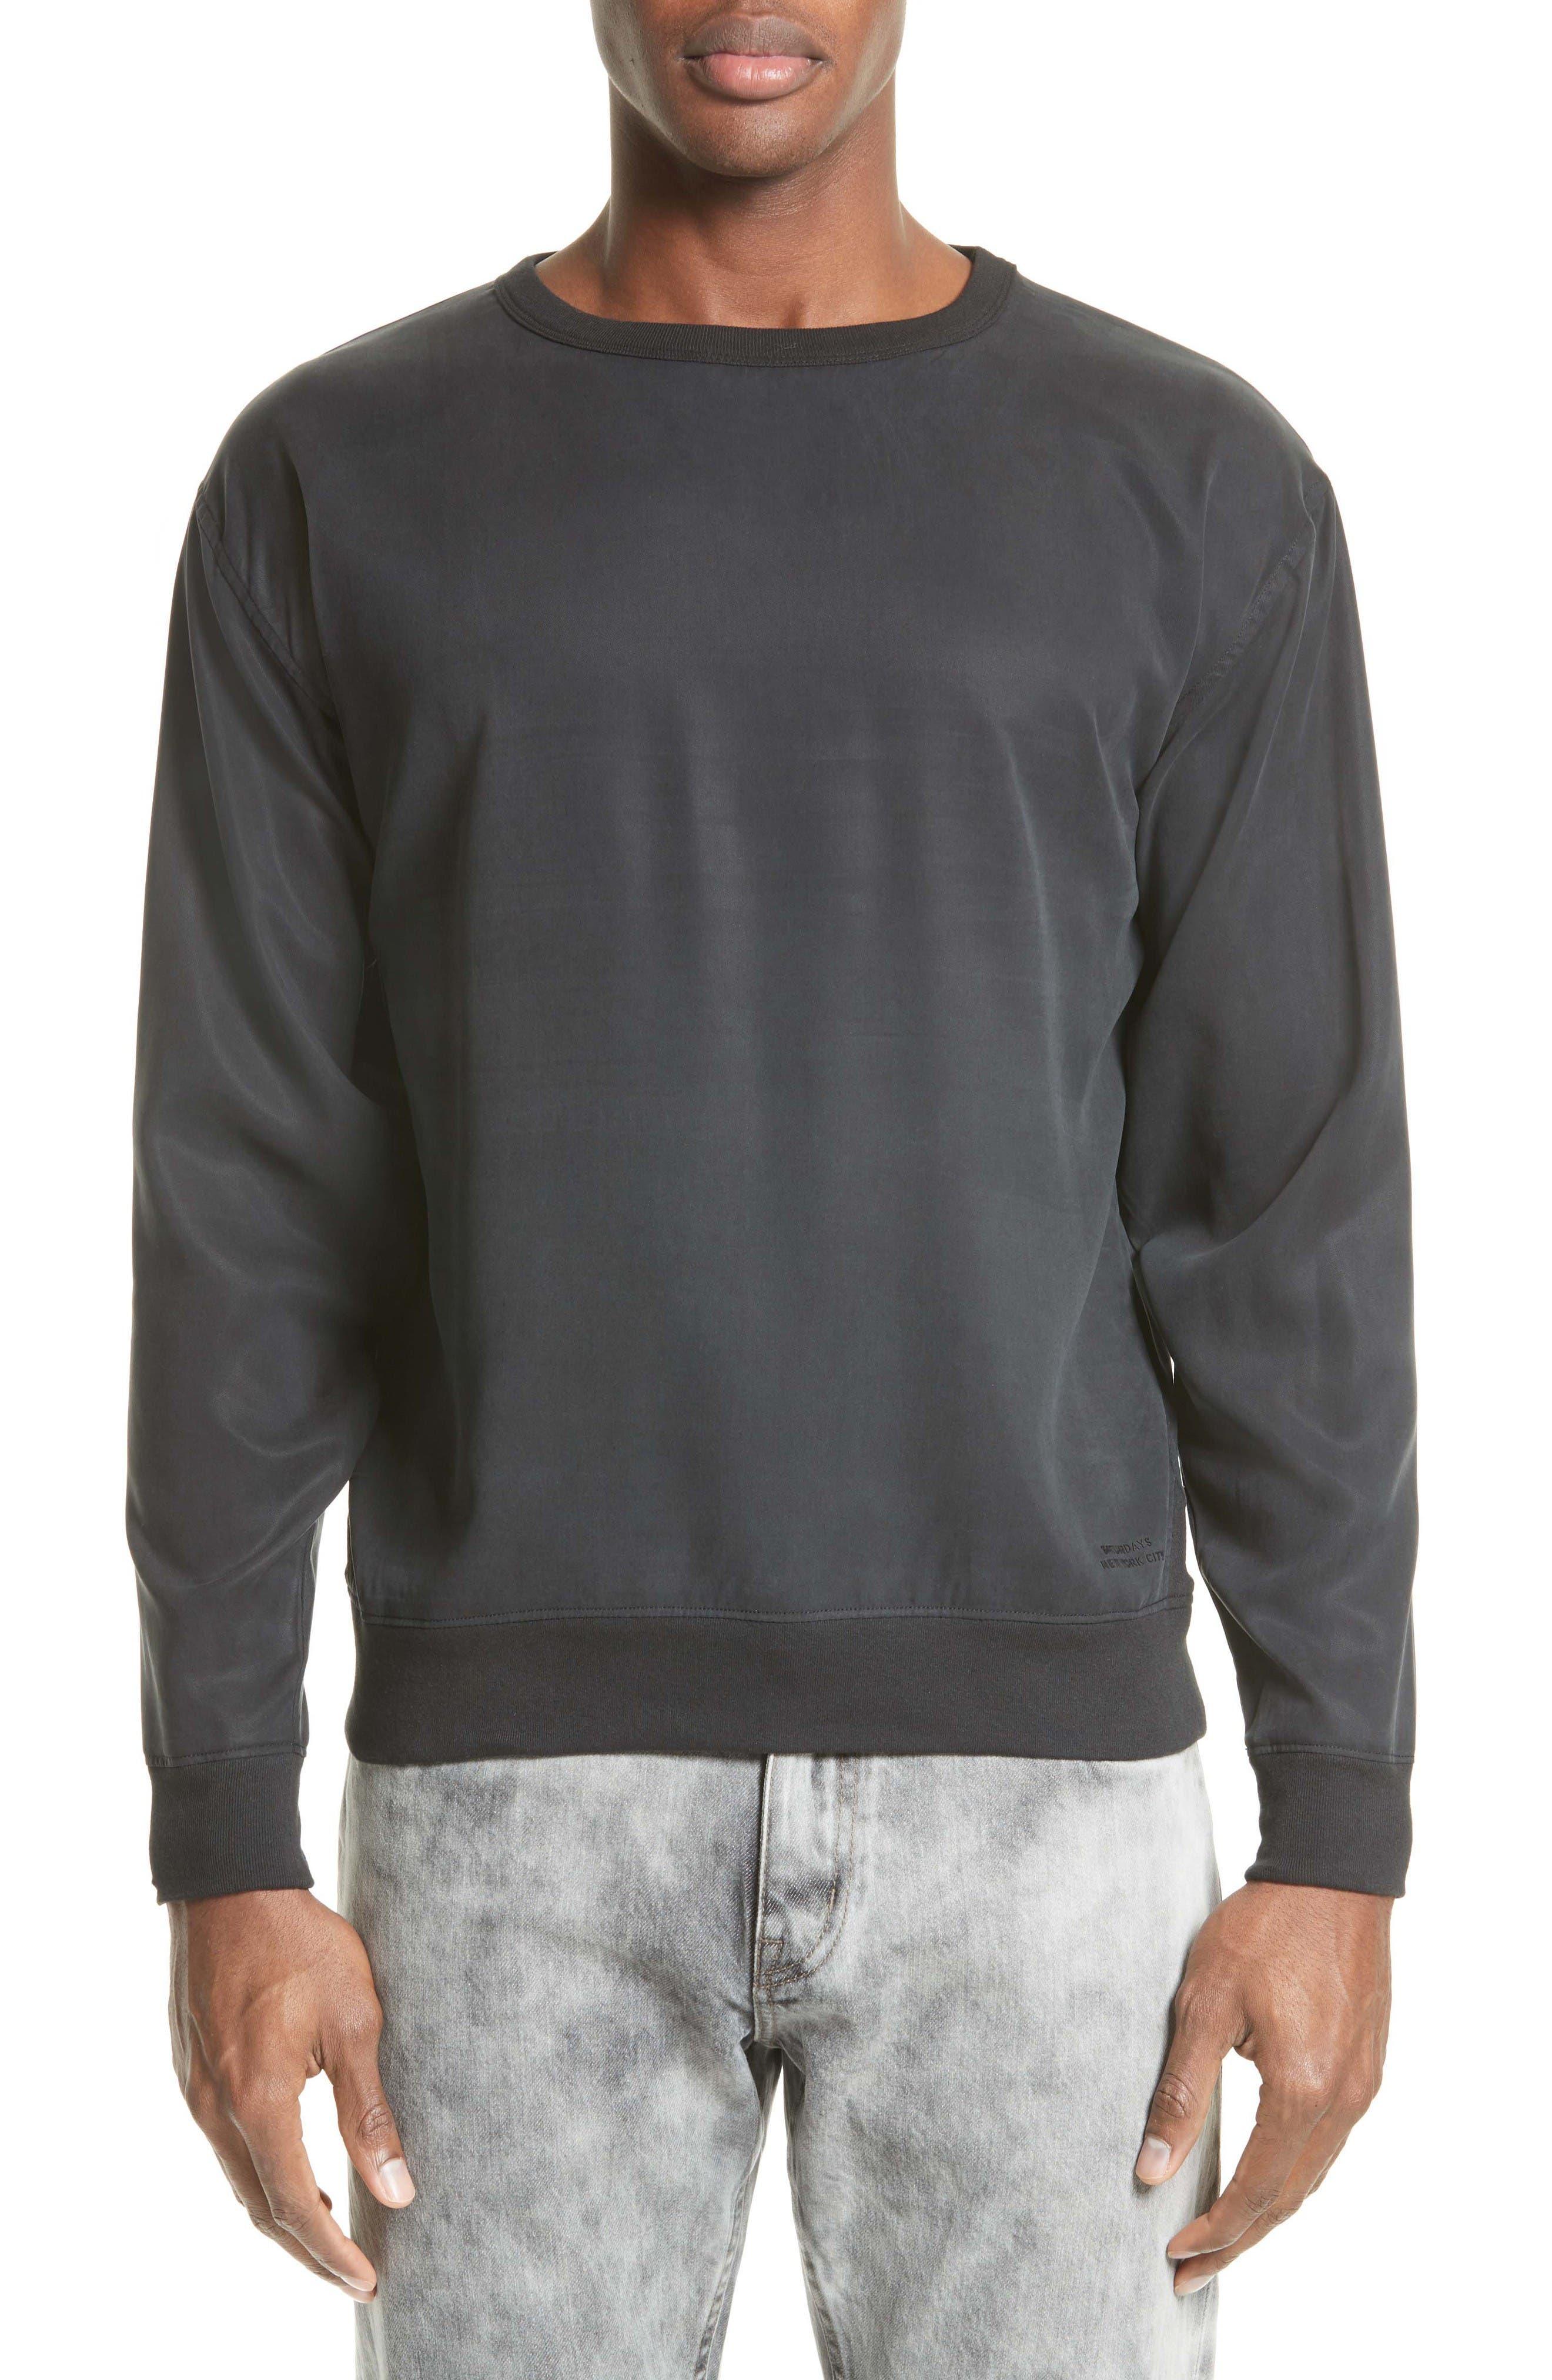 Duey Twill Crewneck Sweatshirt,                         Main,                         color, Black